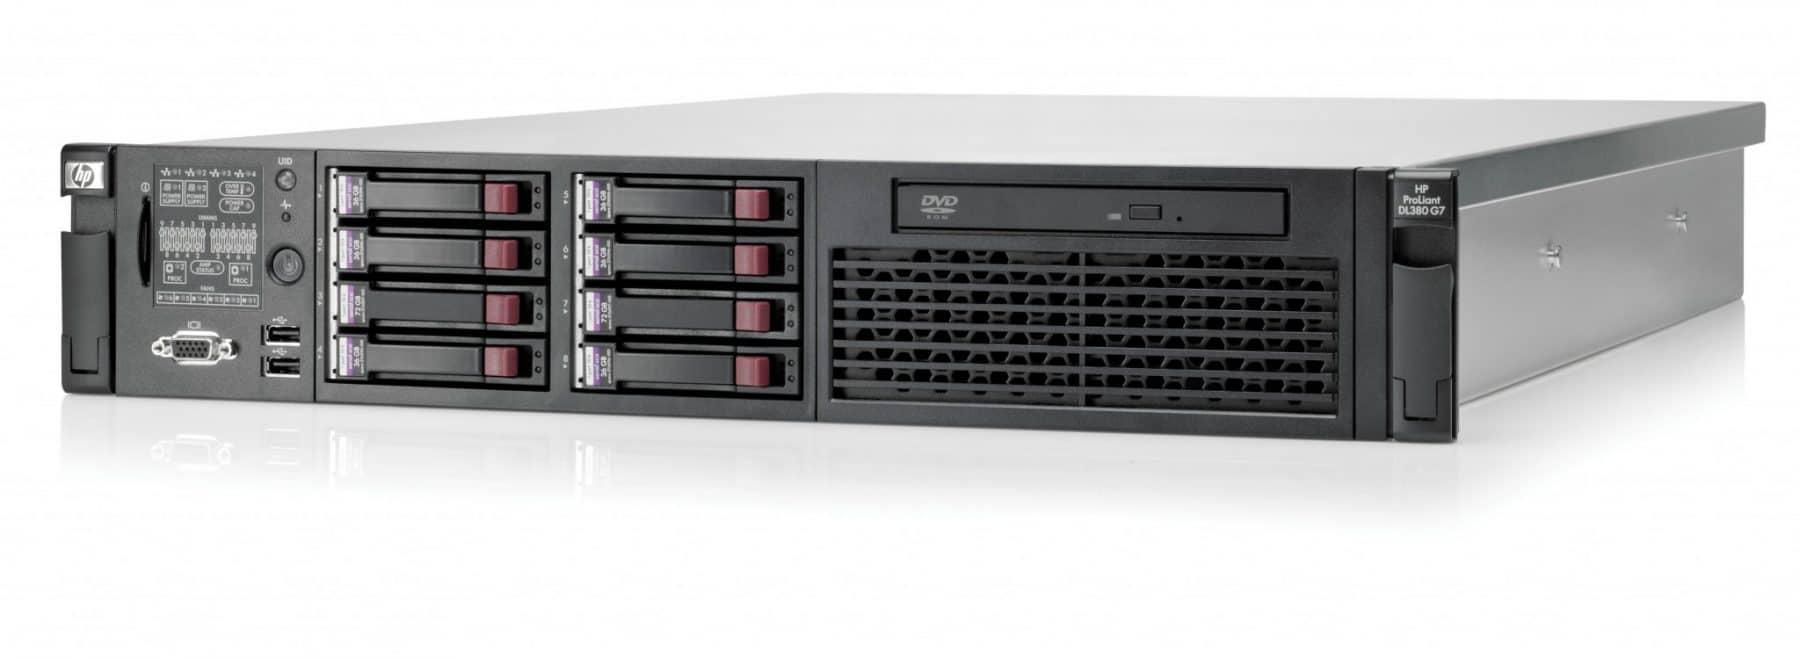 HP-Proliant-DL380-G7-Server-Front-View-1-5-1-2-2-3-1-3-1-1.jpe